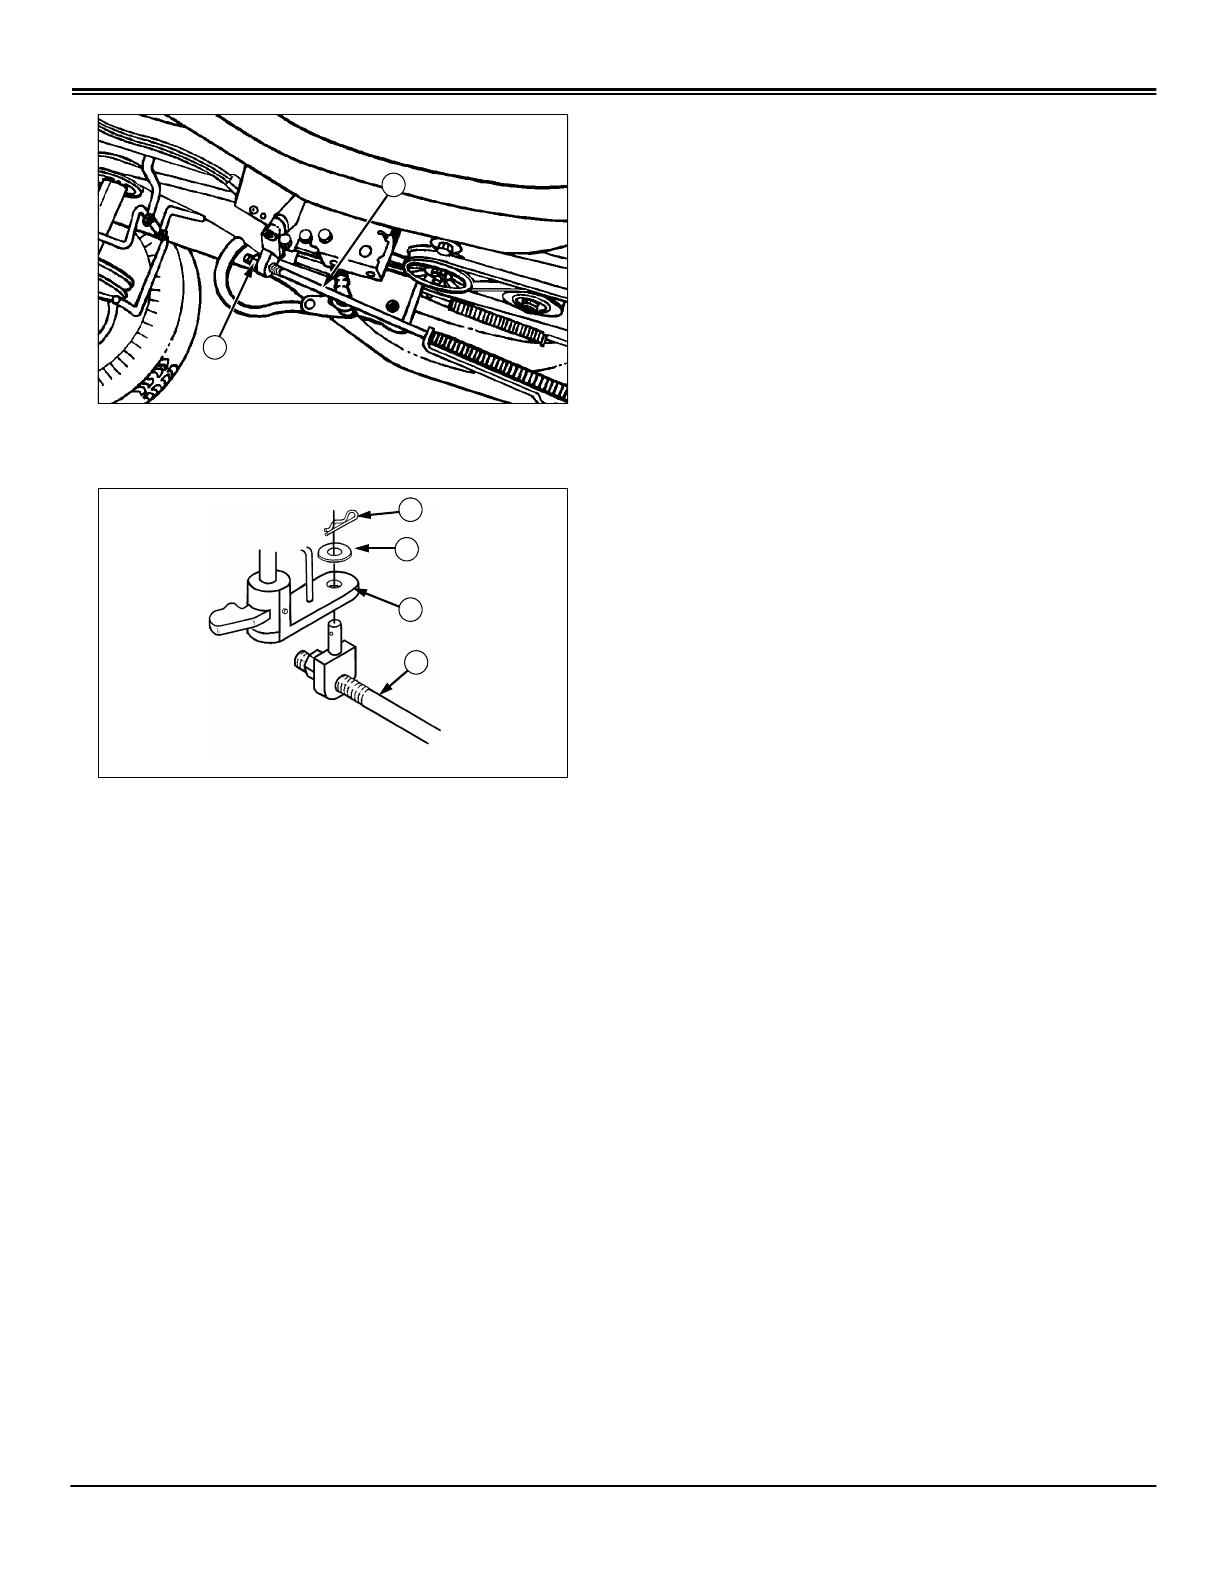 Scotts S1642, S1742, S2046 INSTALLING MOWER